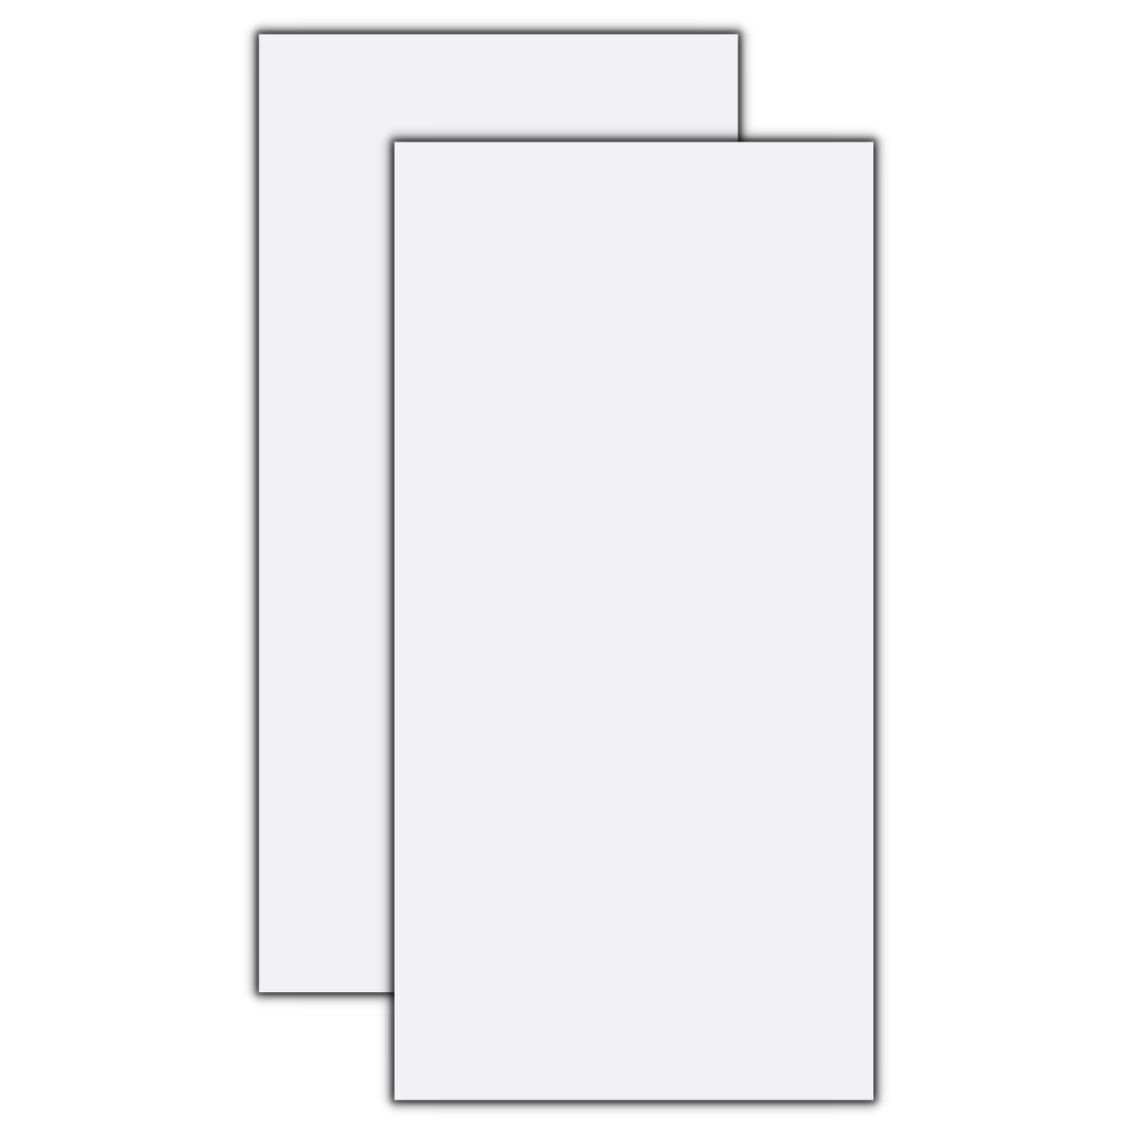 Blanc Acetinado 30x60 cm <br /><b>R$ 64,90 M² </b><br />Cx 2,16 M² <b> R$ 140,18</b>